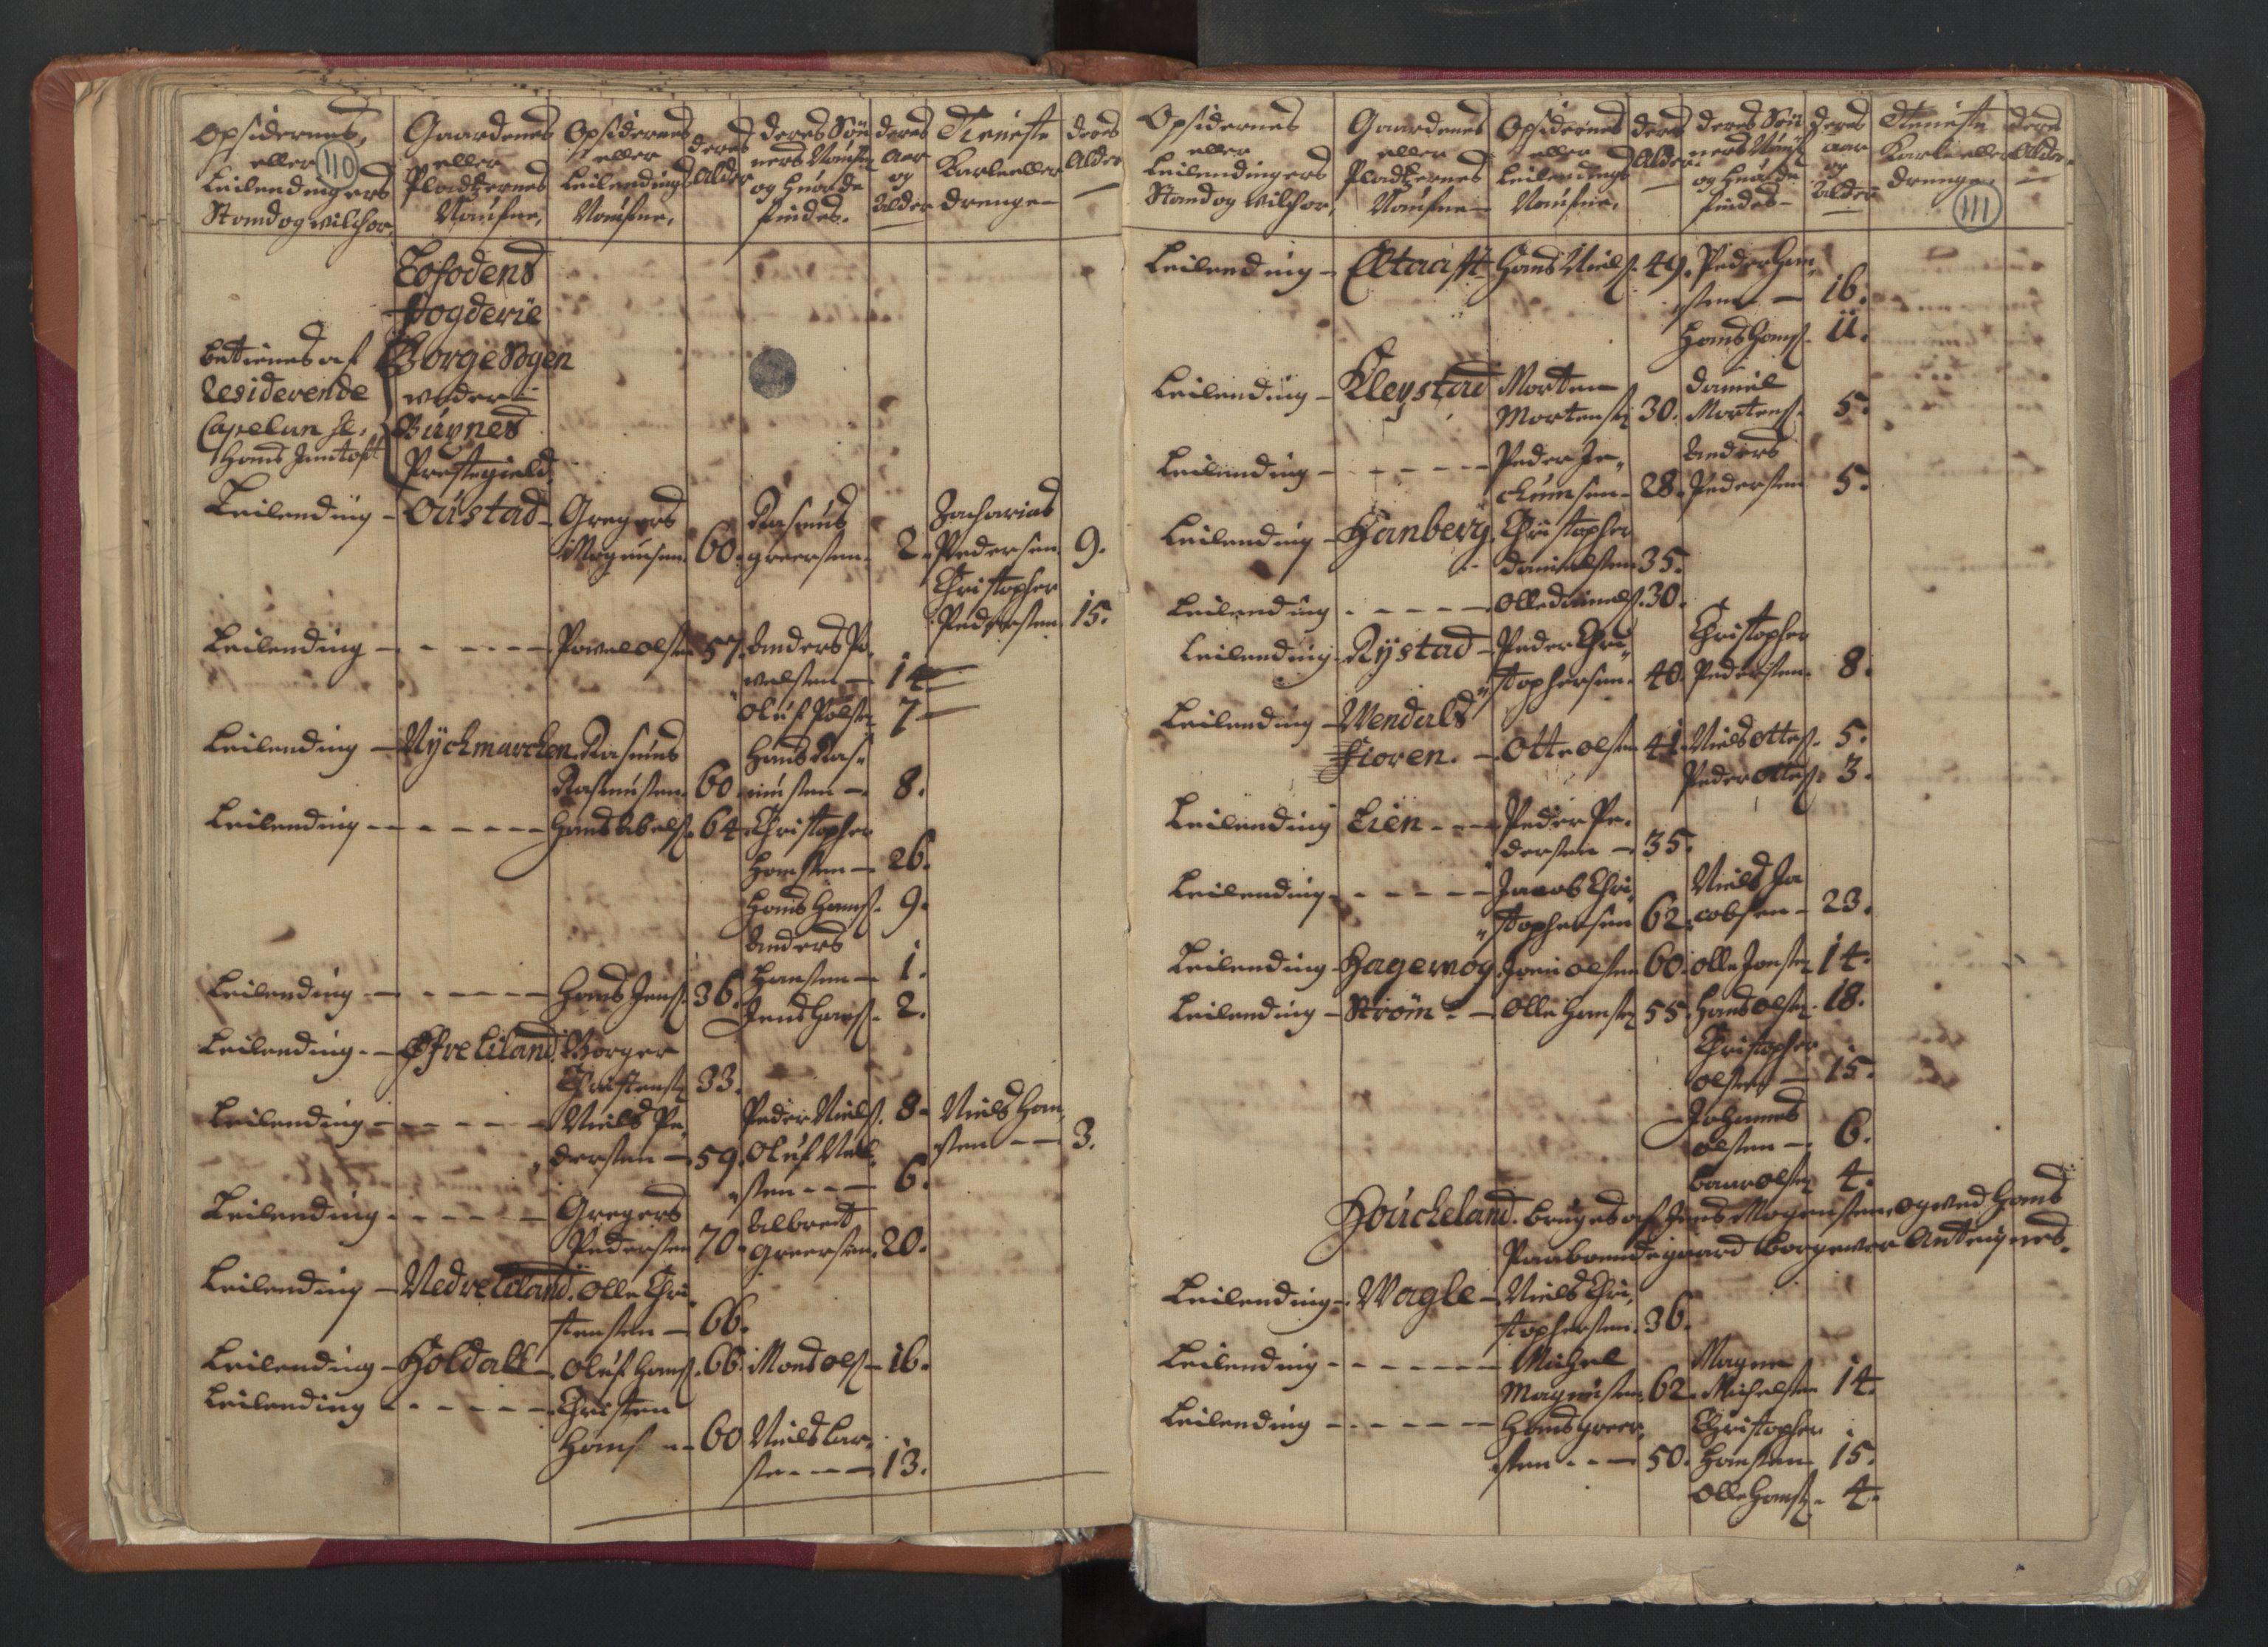 RA, Manntallet 1701, nr. 18: Vesterålen, Andenes og Lofoten fogderi, 1701, s. 110-111